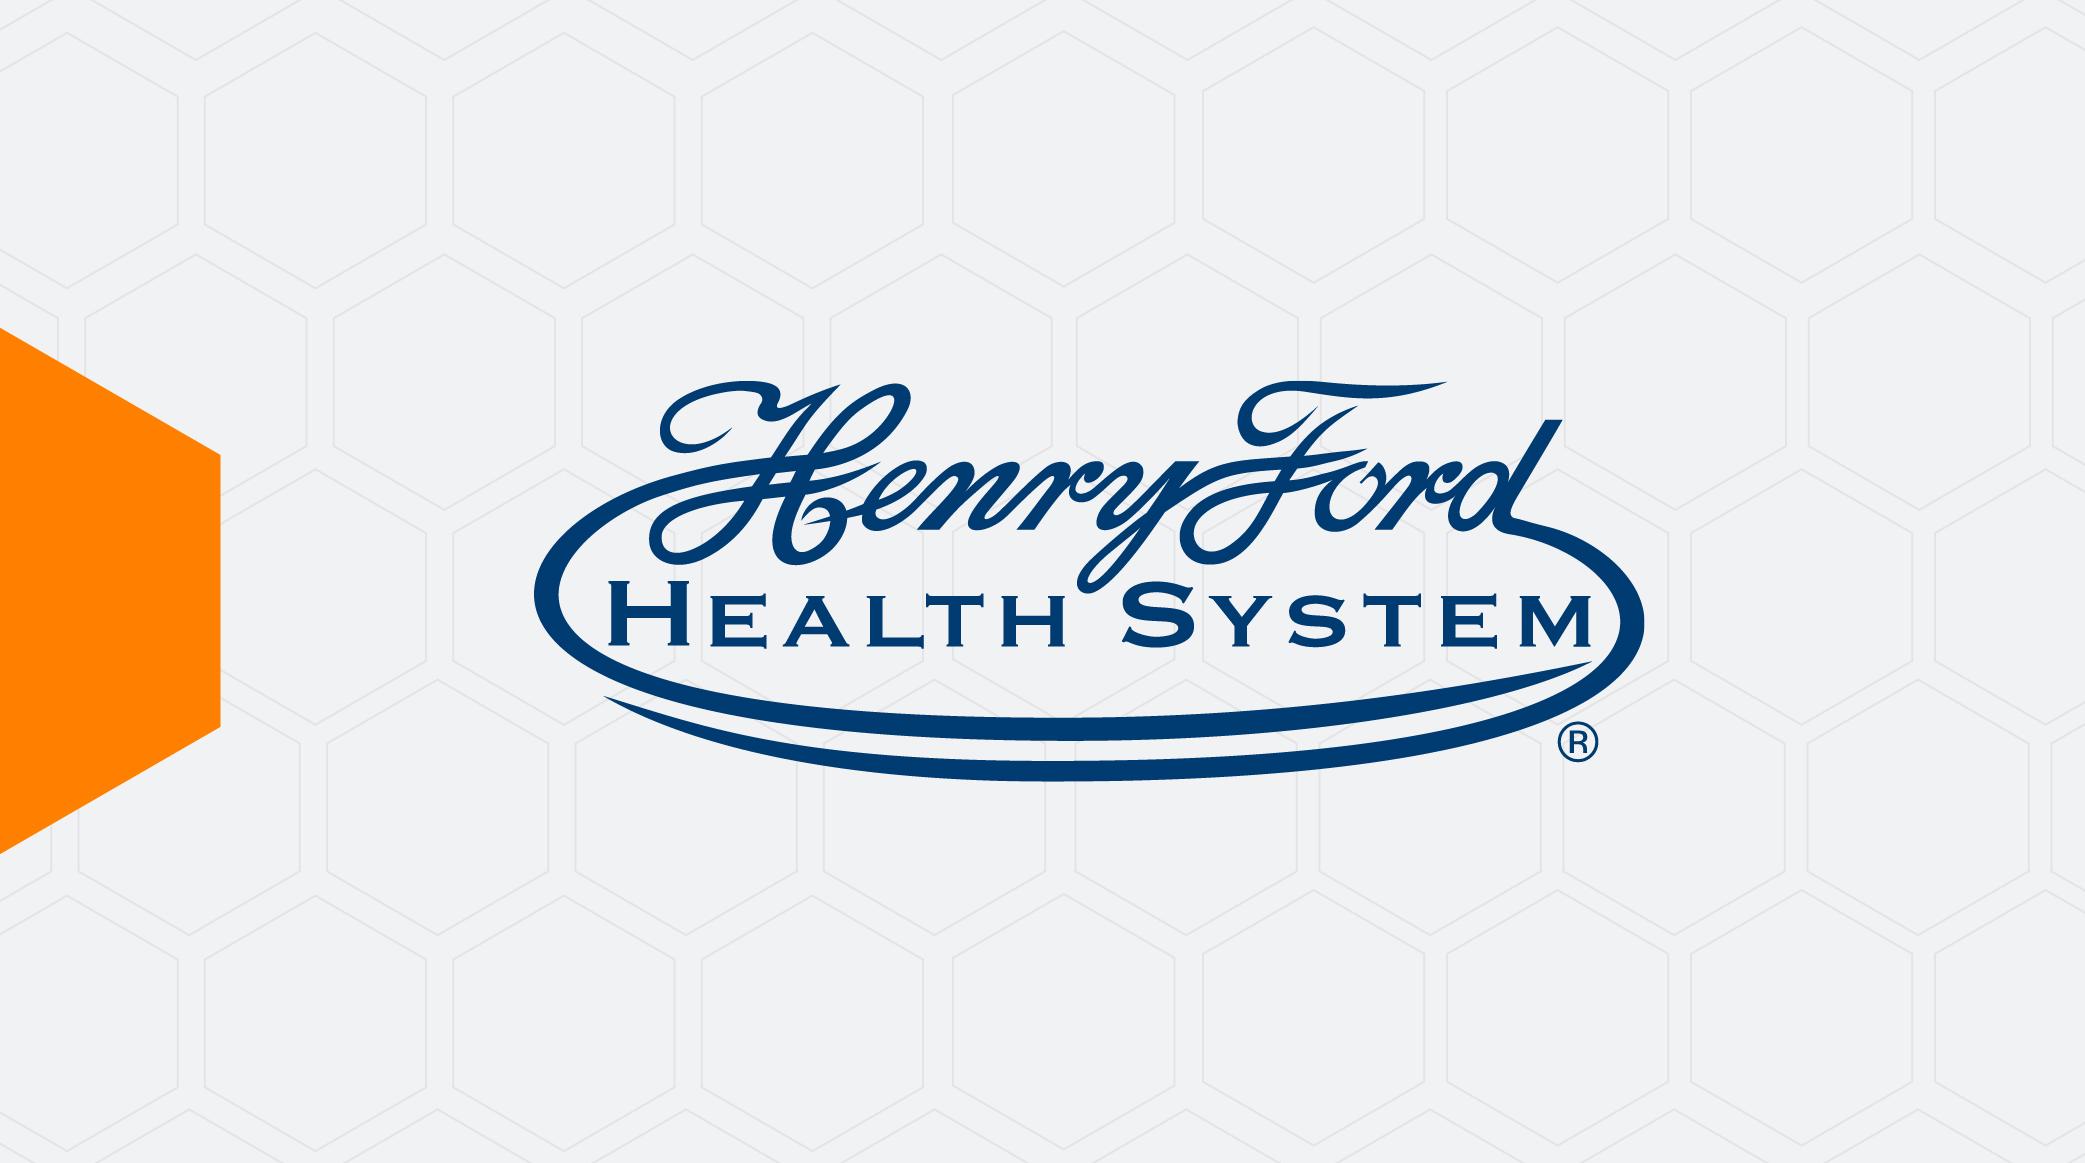 Henry Ford Health System partnership story